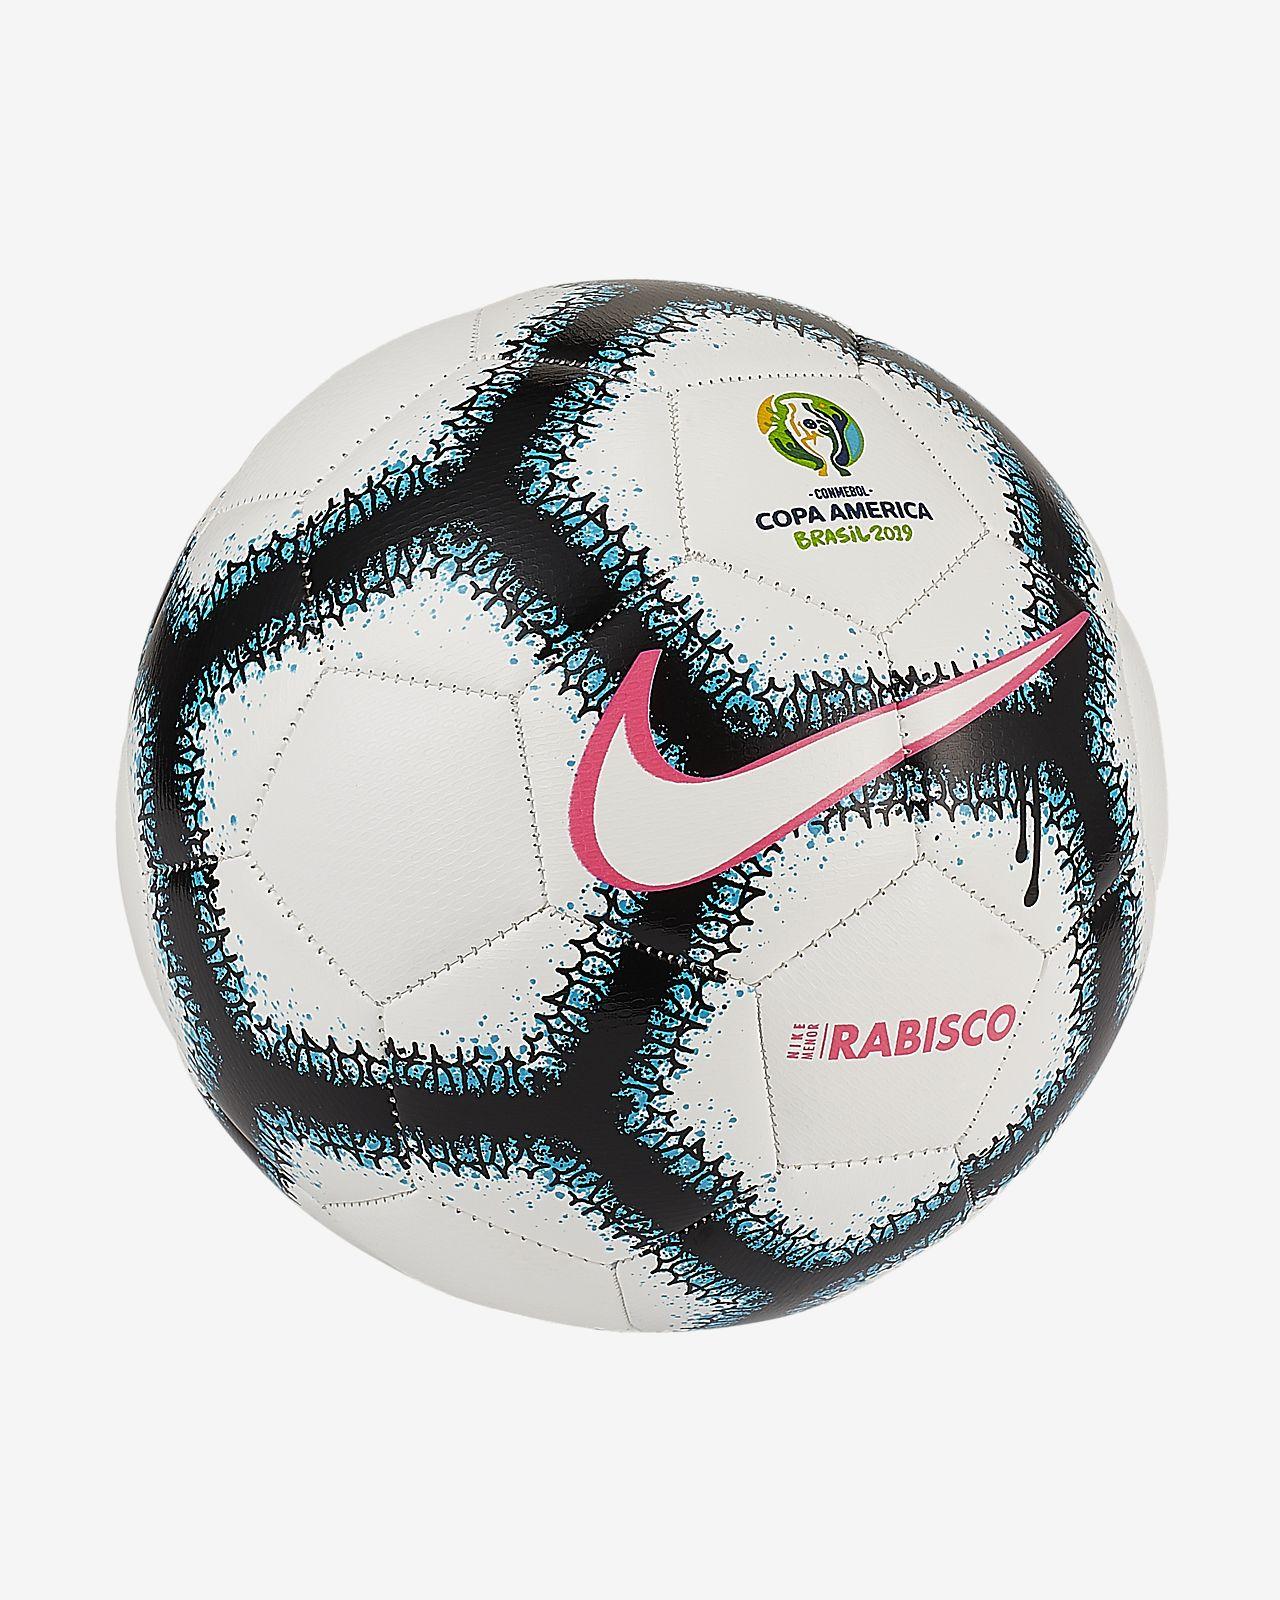 Nike Menor X Rabisco Copa America 2019 fotball